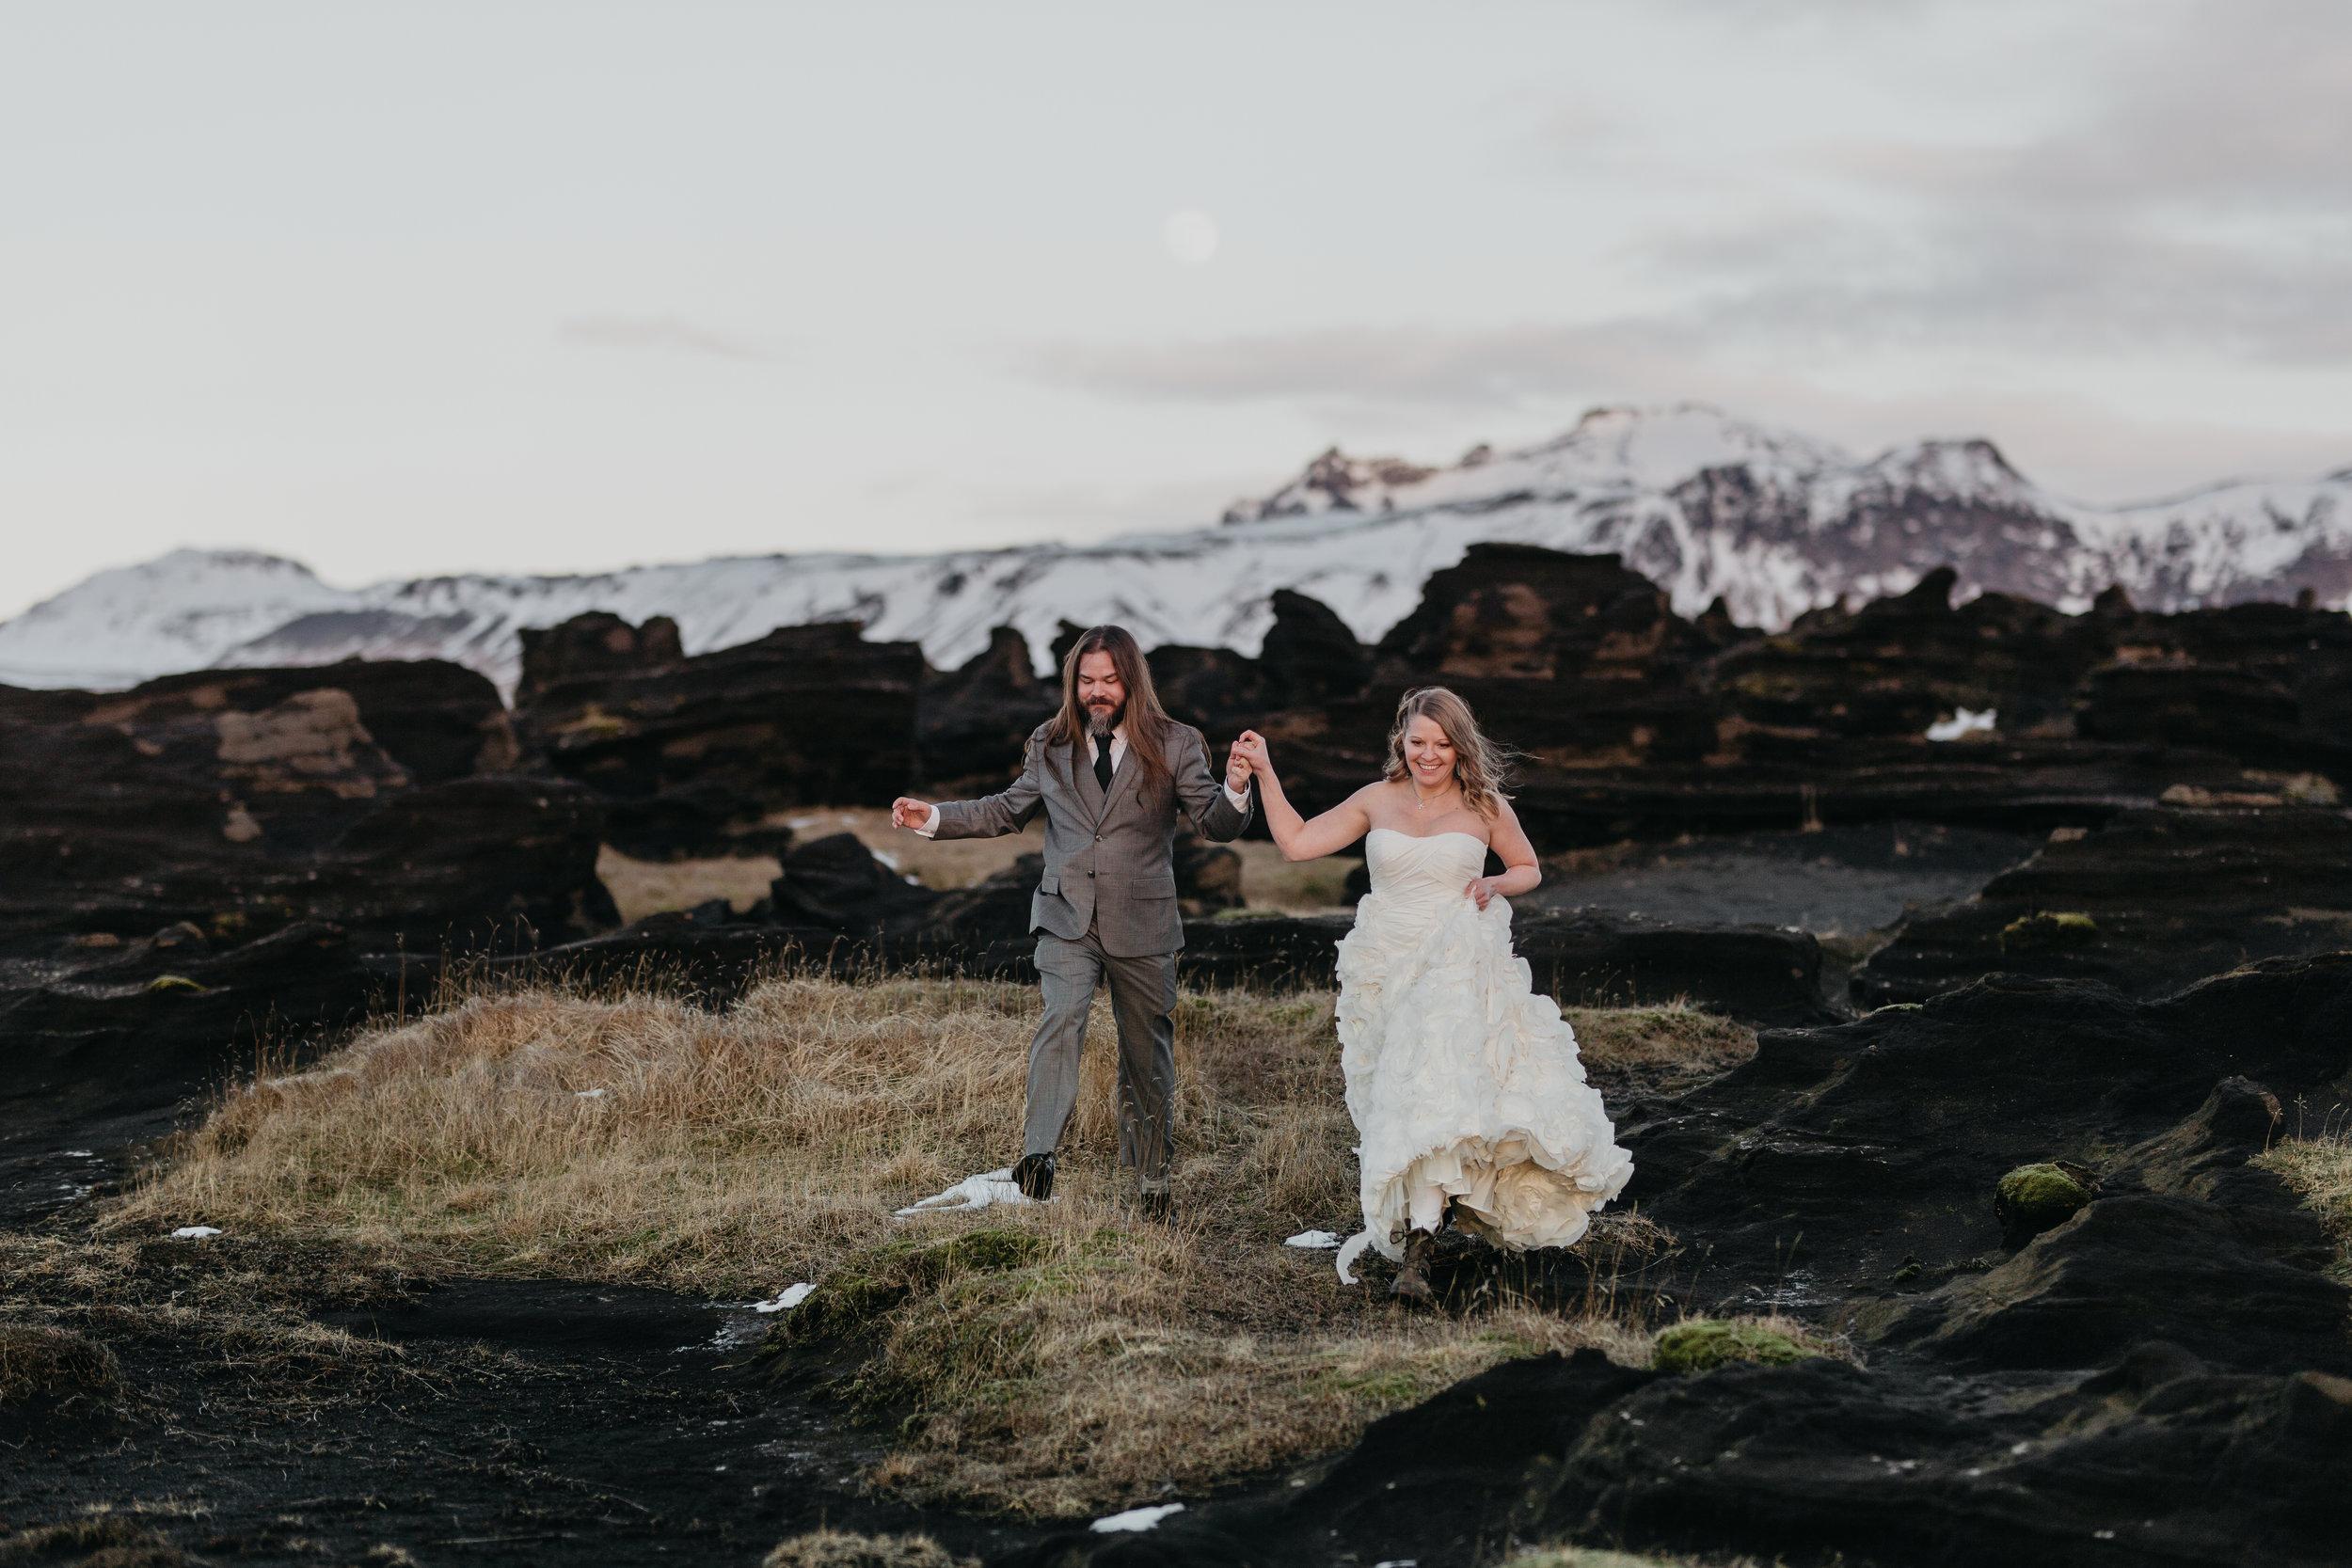 nicole-daacke-photography-iceland-winter-sunset-adventure-elopement-skogafoss-waterfall-black-sand-beach-dyrholaey-vik-iceland-intimate-wedding-black-church-elopement-photographer-27.jpg